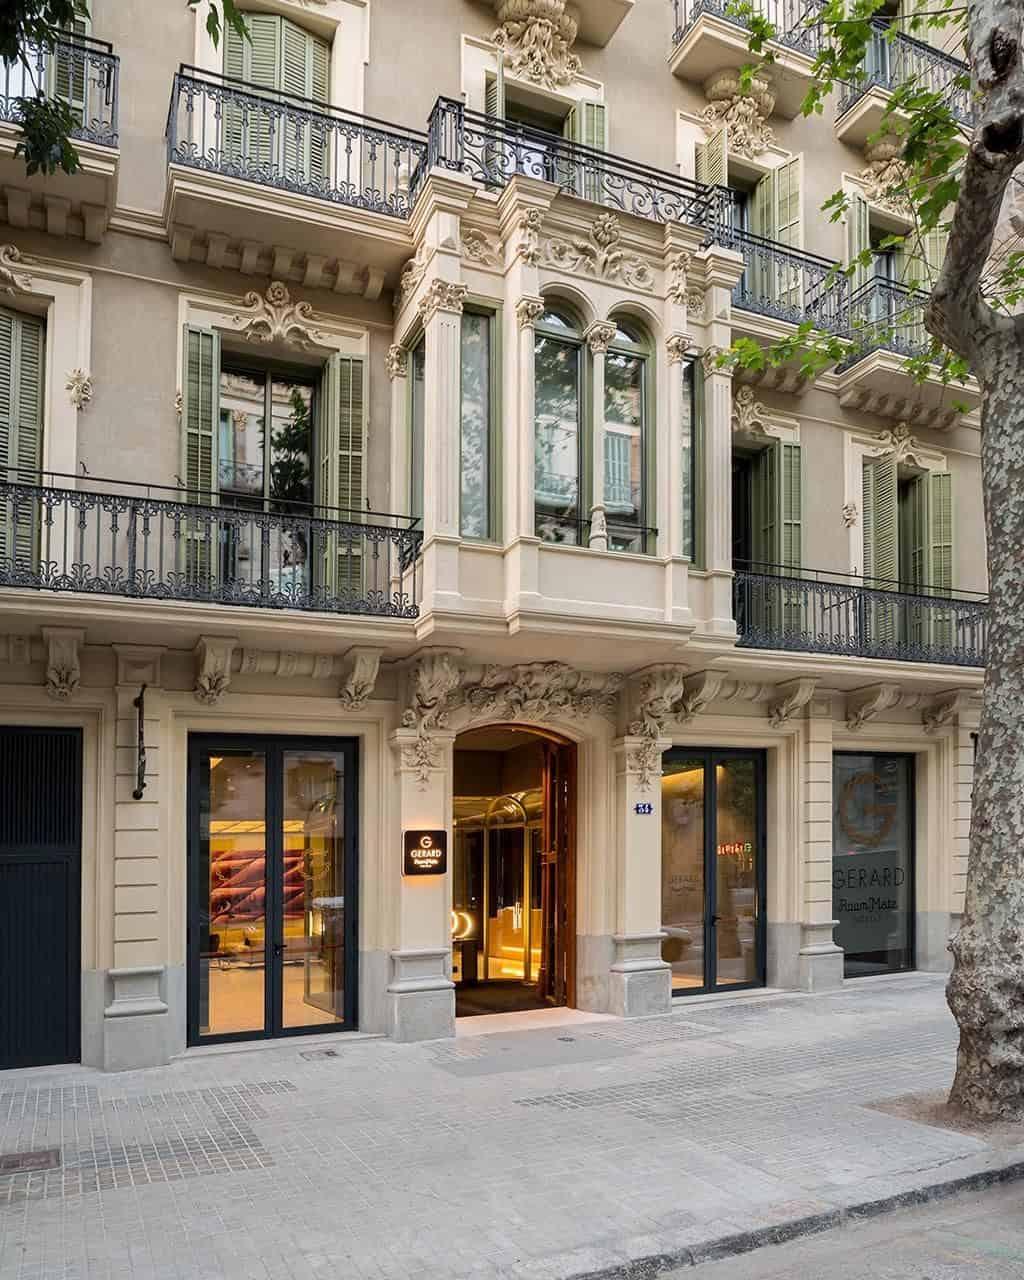 Hotel in Barcelona, Spain Designed by Jaime Beriestain